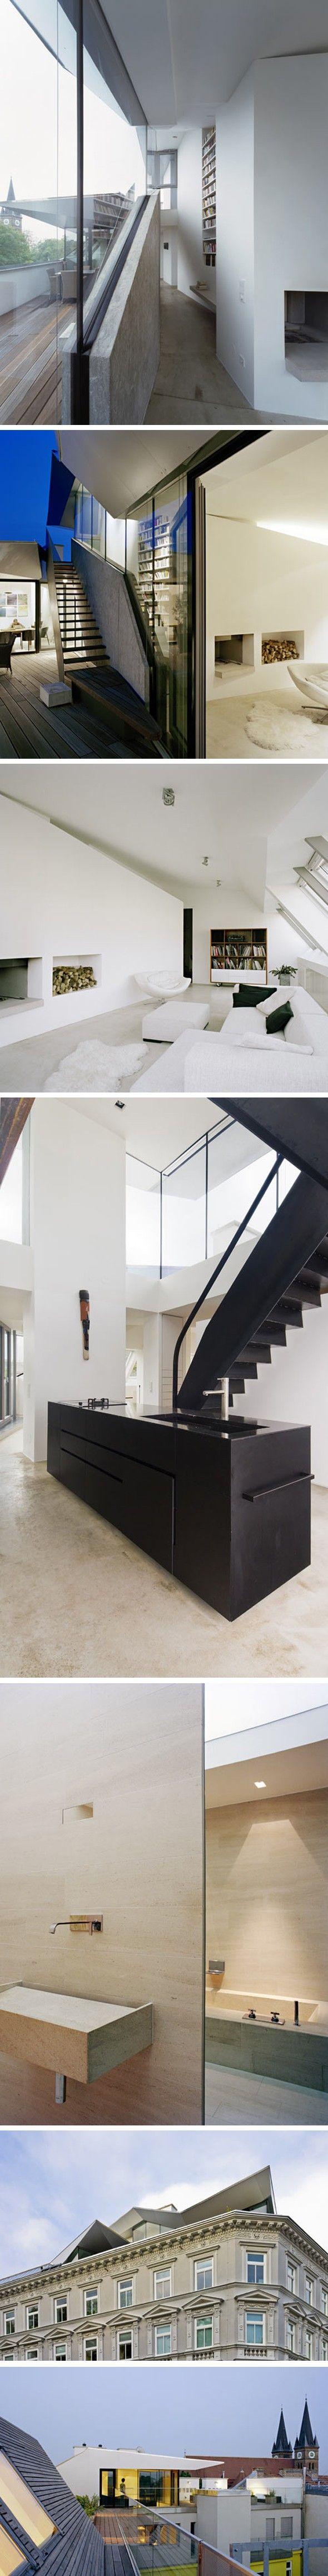 11 best meubelboer furniture images on pinterest cement - Lakonis architekten ...